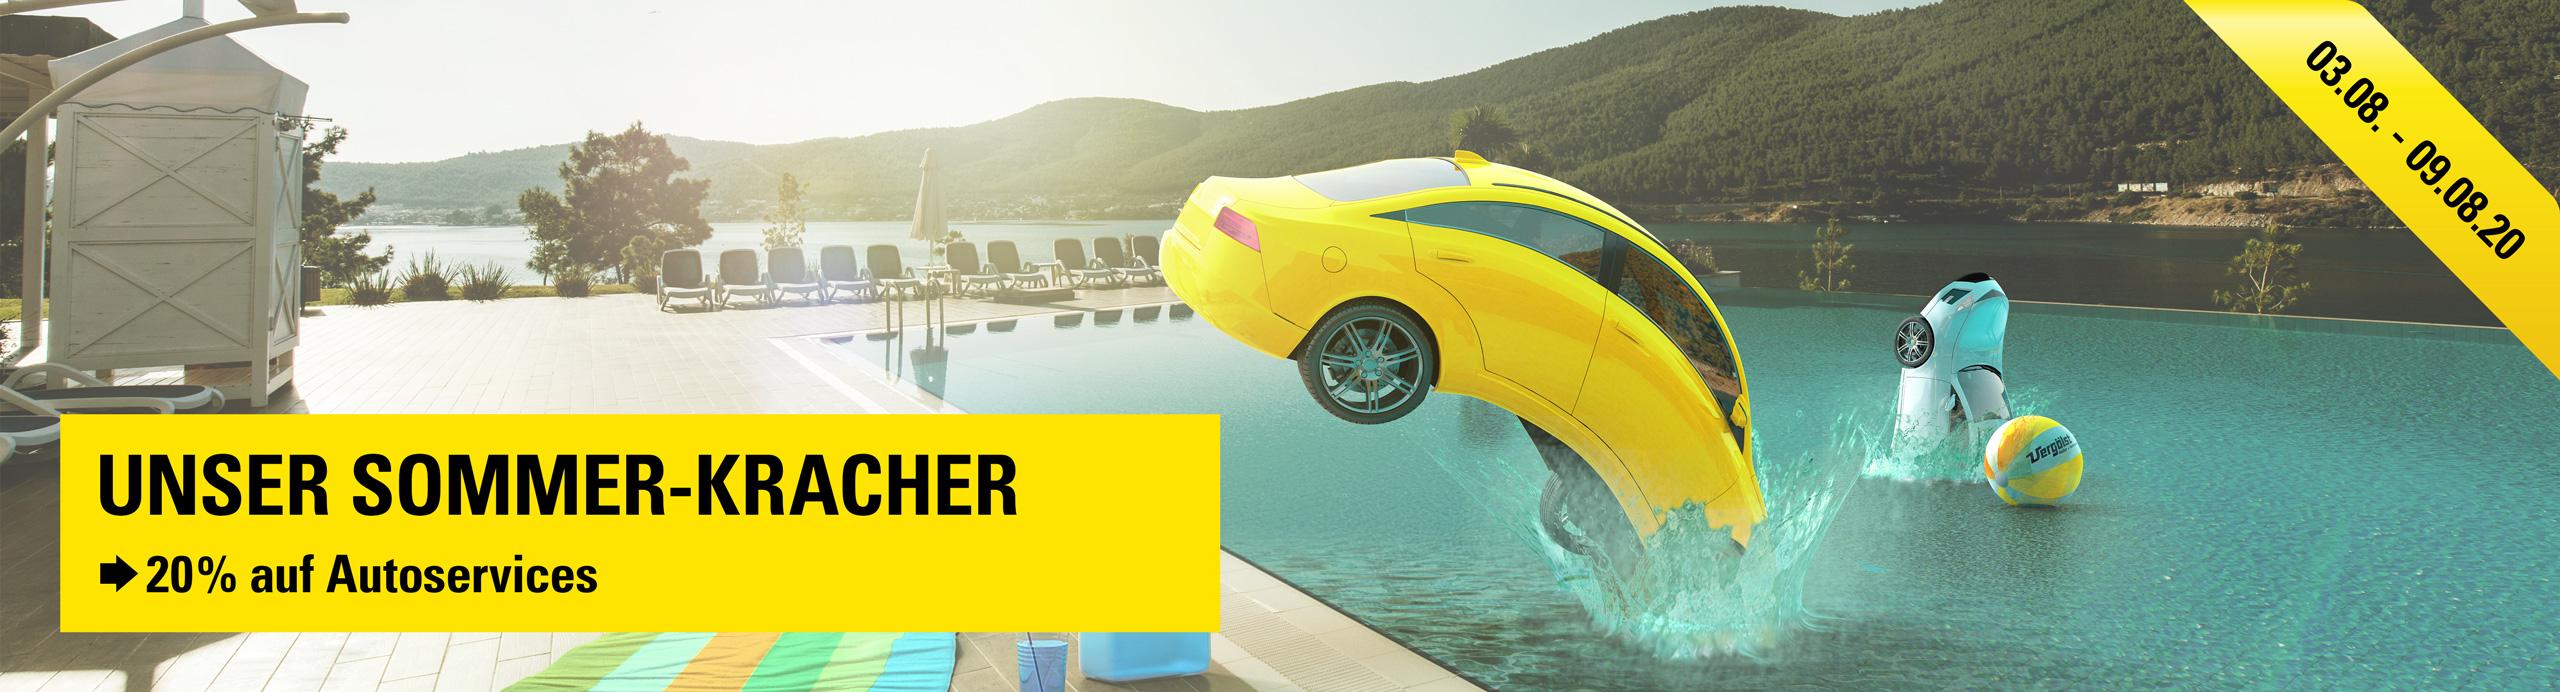 20% Rabatt auf Autoservices